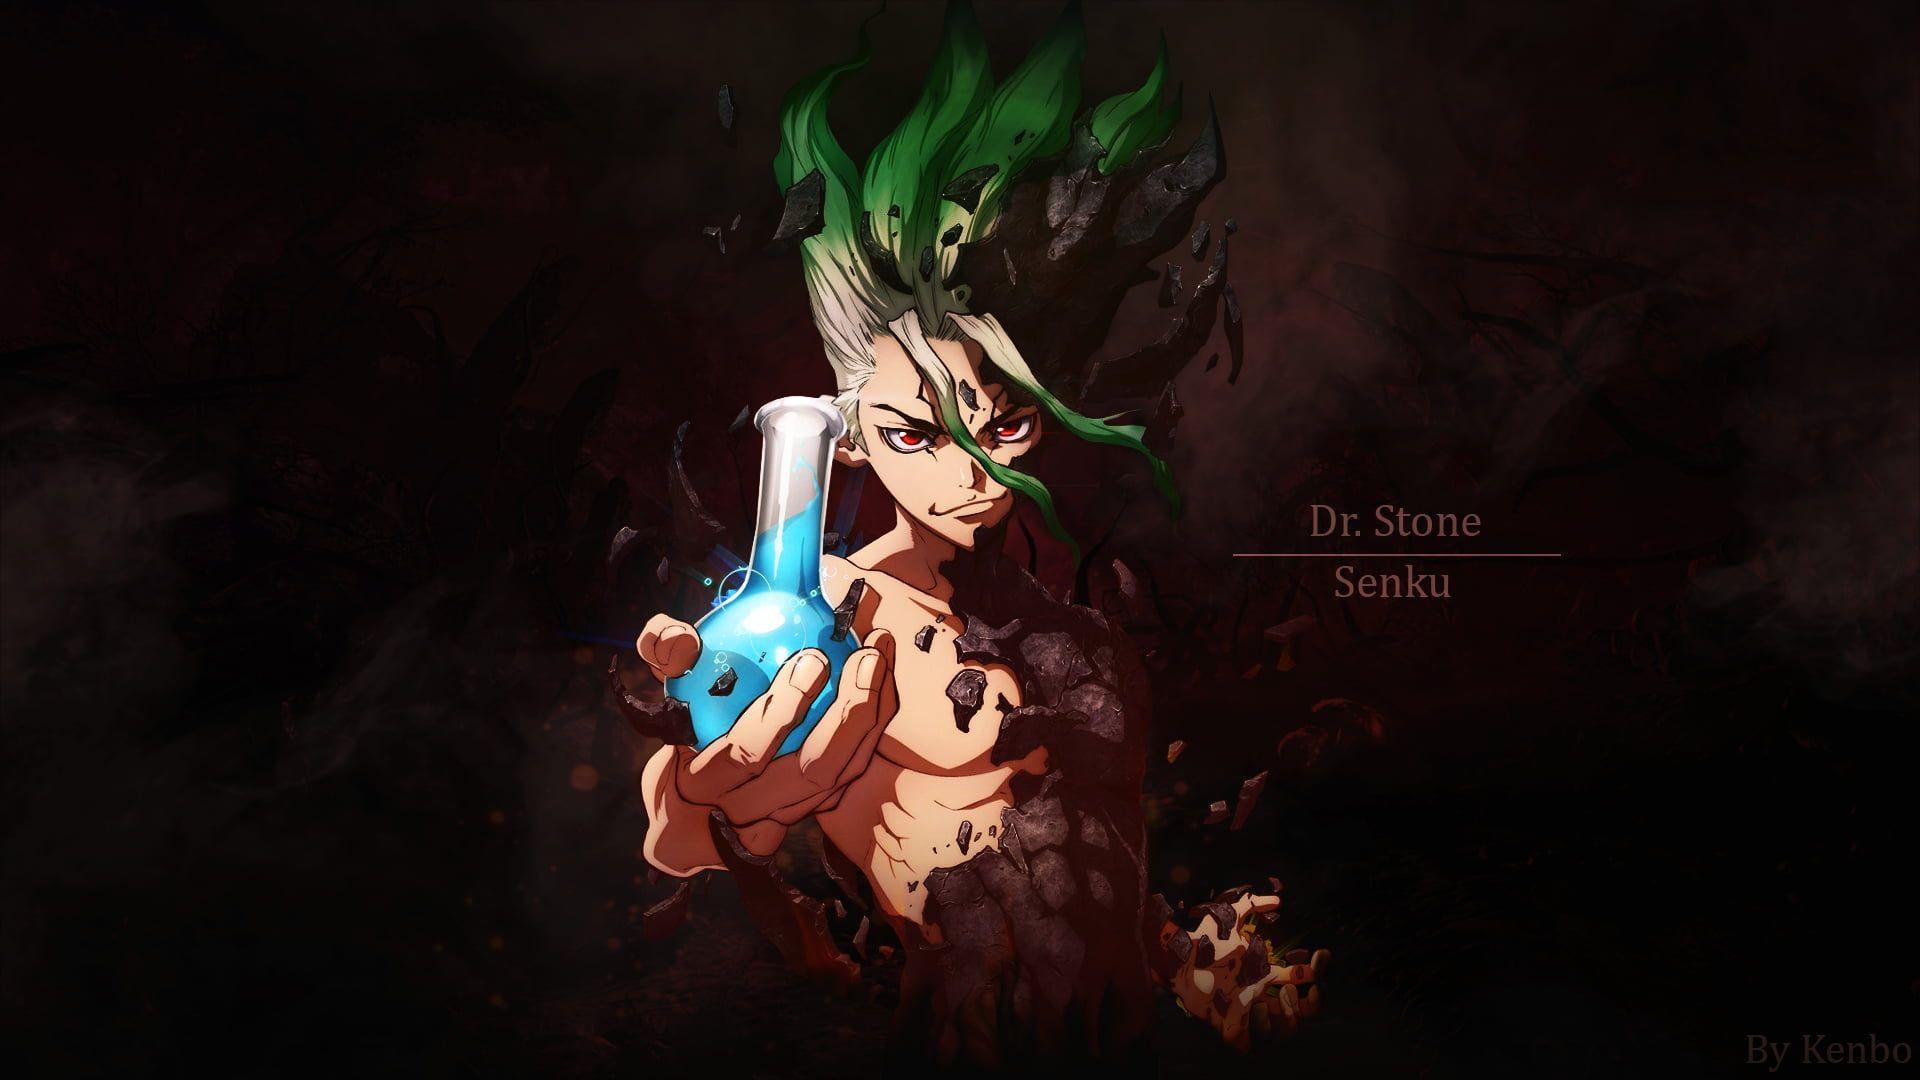 Dr Stone Senkuu Ishigami Anime Anime Boys Anime Men Flask Science Scientists Science Fiction Experiments Green Green Hai Anime Wallpaper Anime Anime Boy